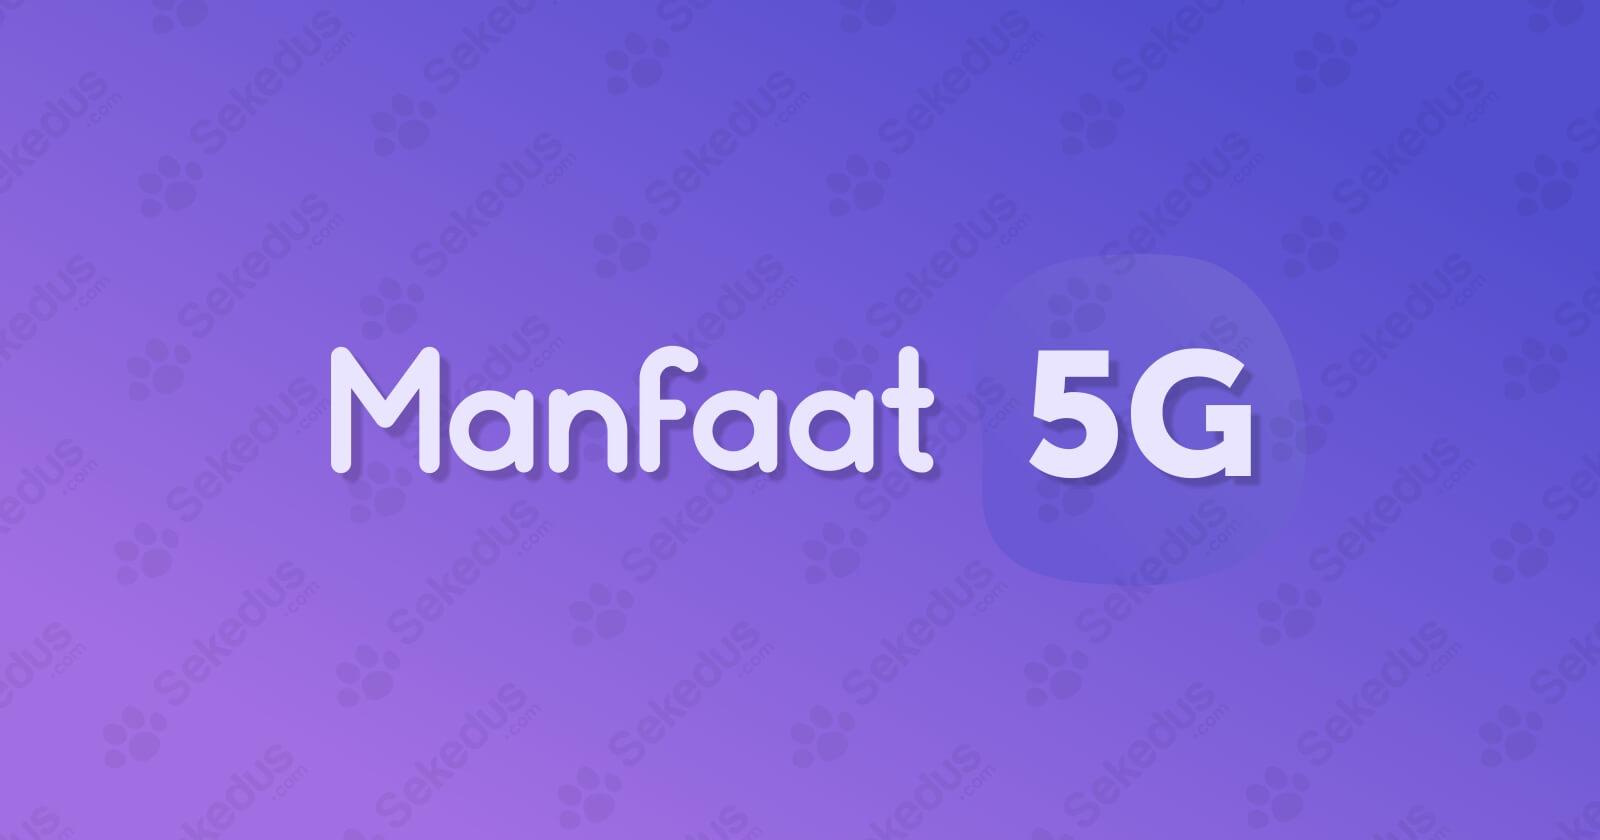 Manfaat Teknologi 5G